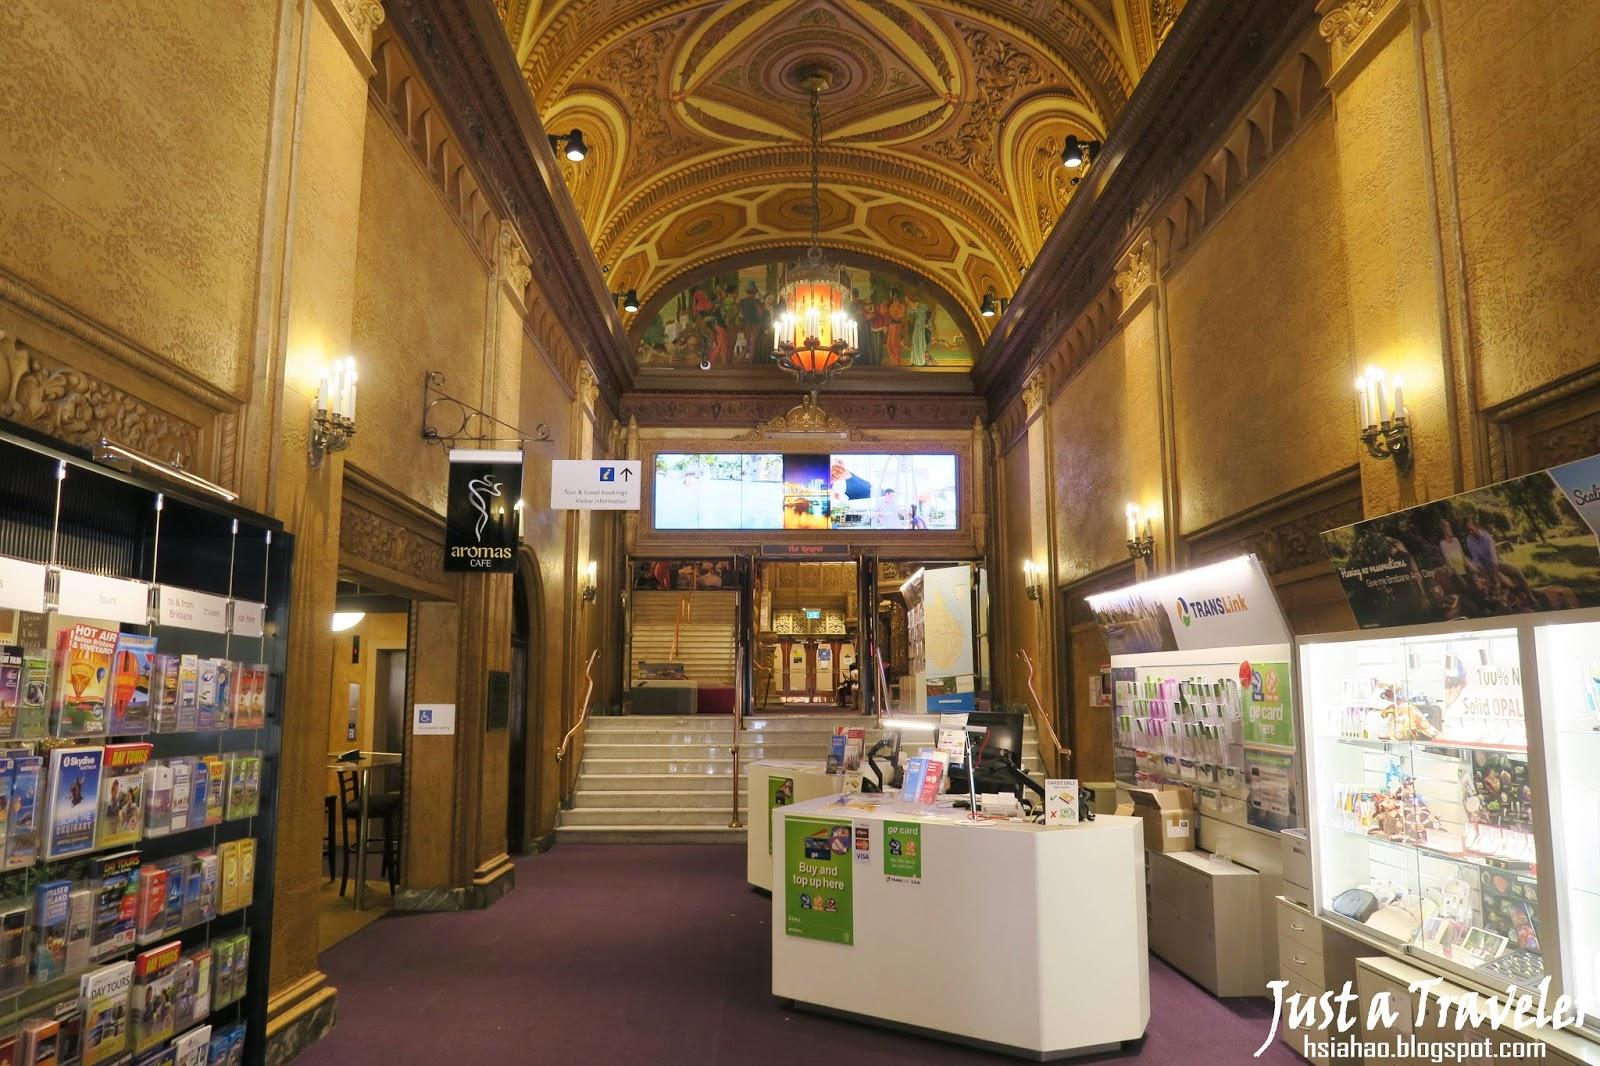 布里斯本-景點-推薦-皇后街-女王街-逛街購物-旅客服務中心-Visitor-Information-澳洲-Brisbane-Queen-Street-Travel-Tourist-Attraction-Australia